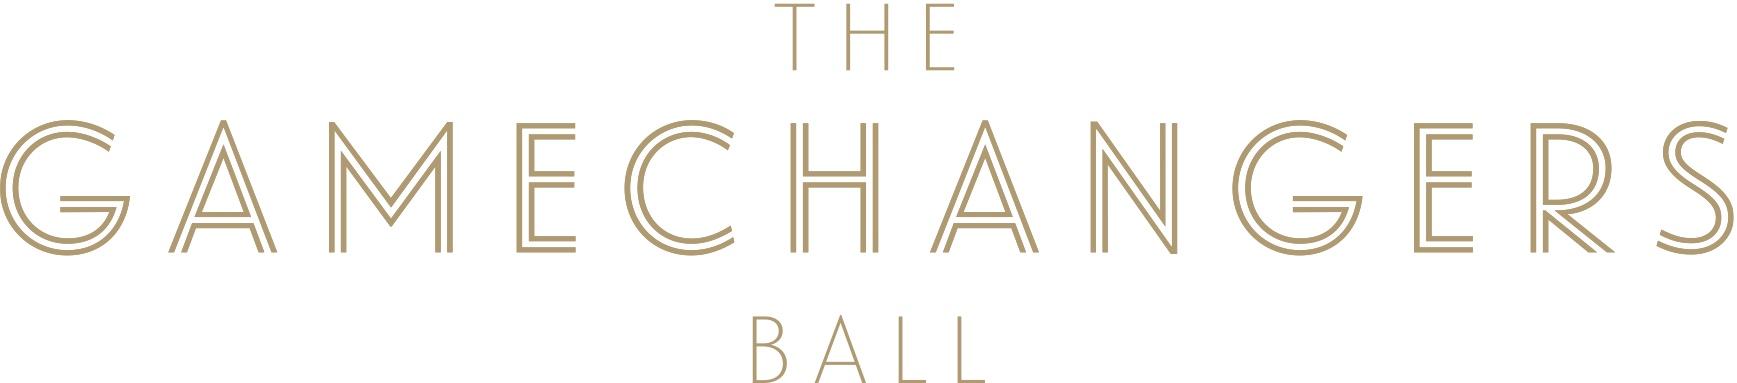 GameChanger Ball GOLD.jpg